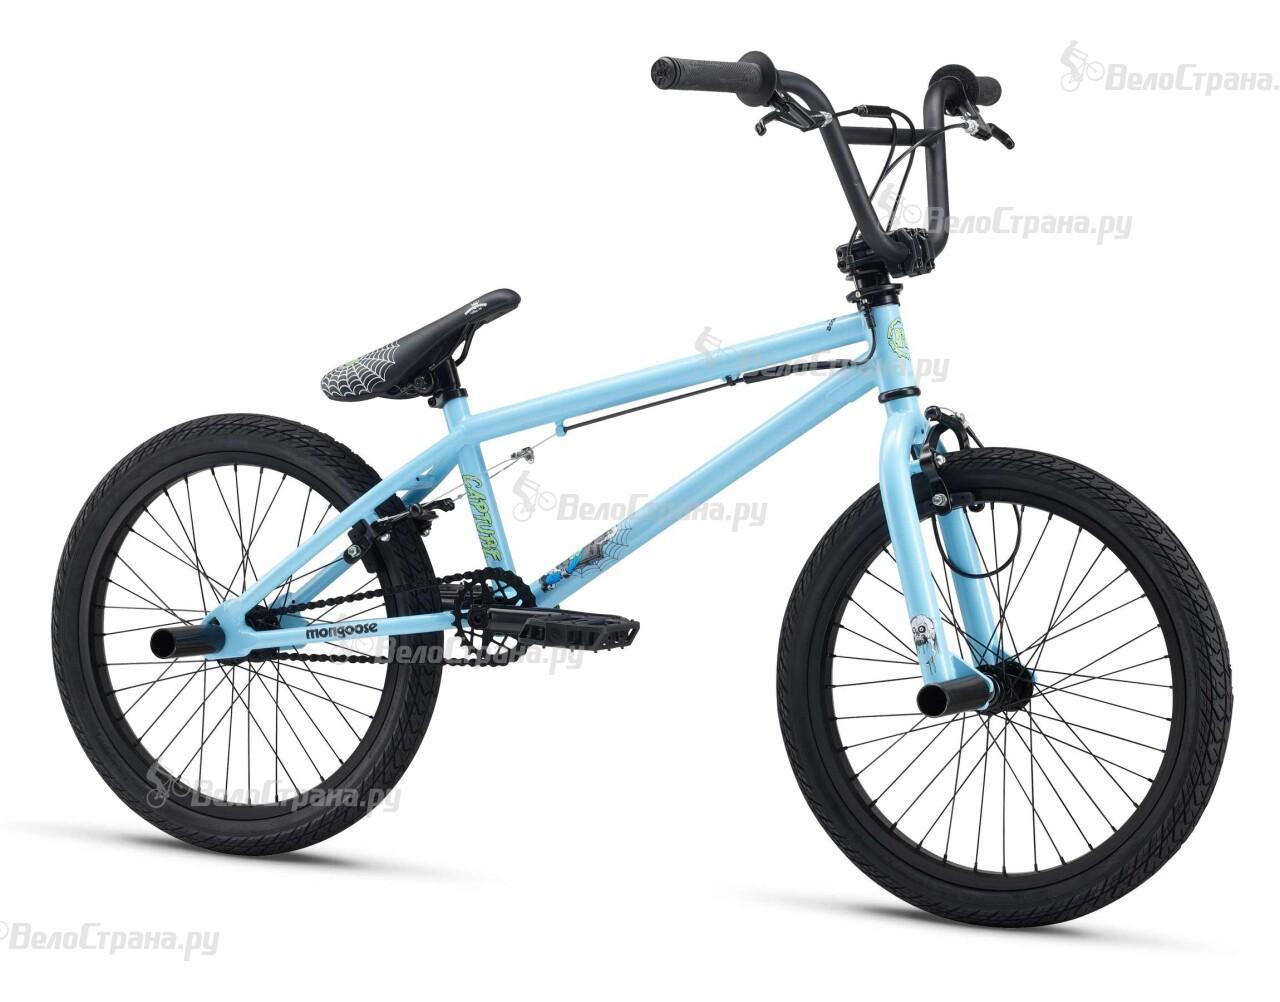 все цены на Велосипед Mongoose Meteore Comp 29'R (2013) онлайн